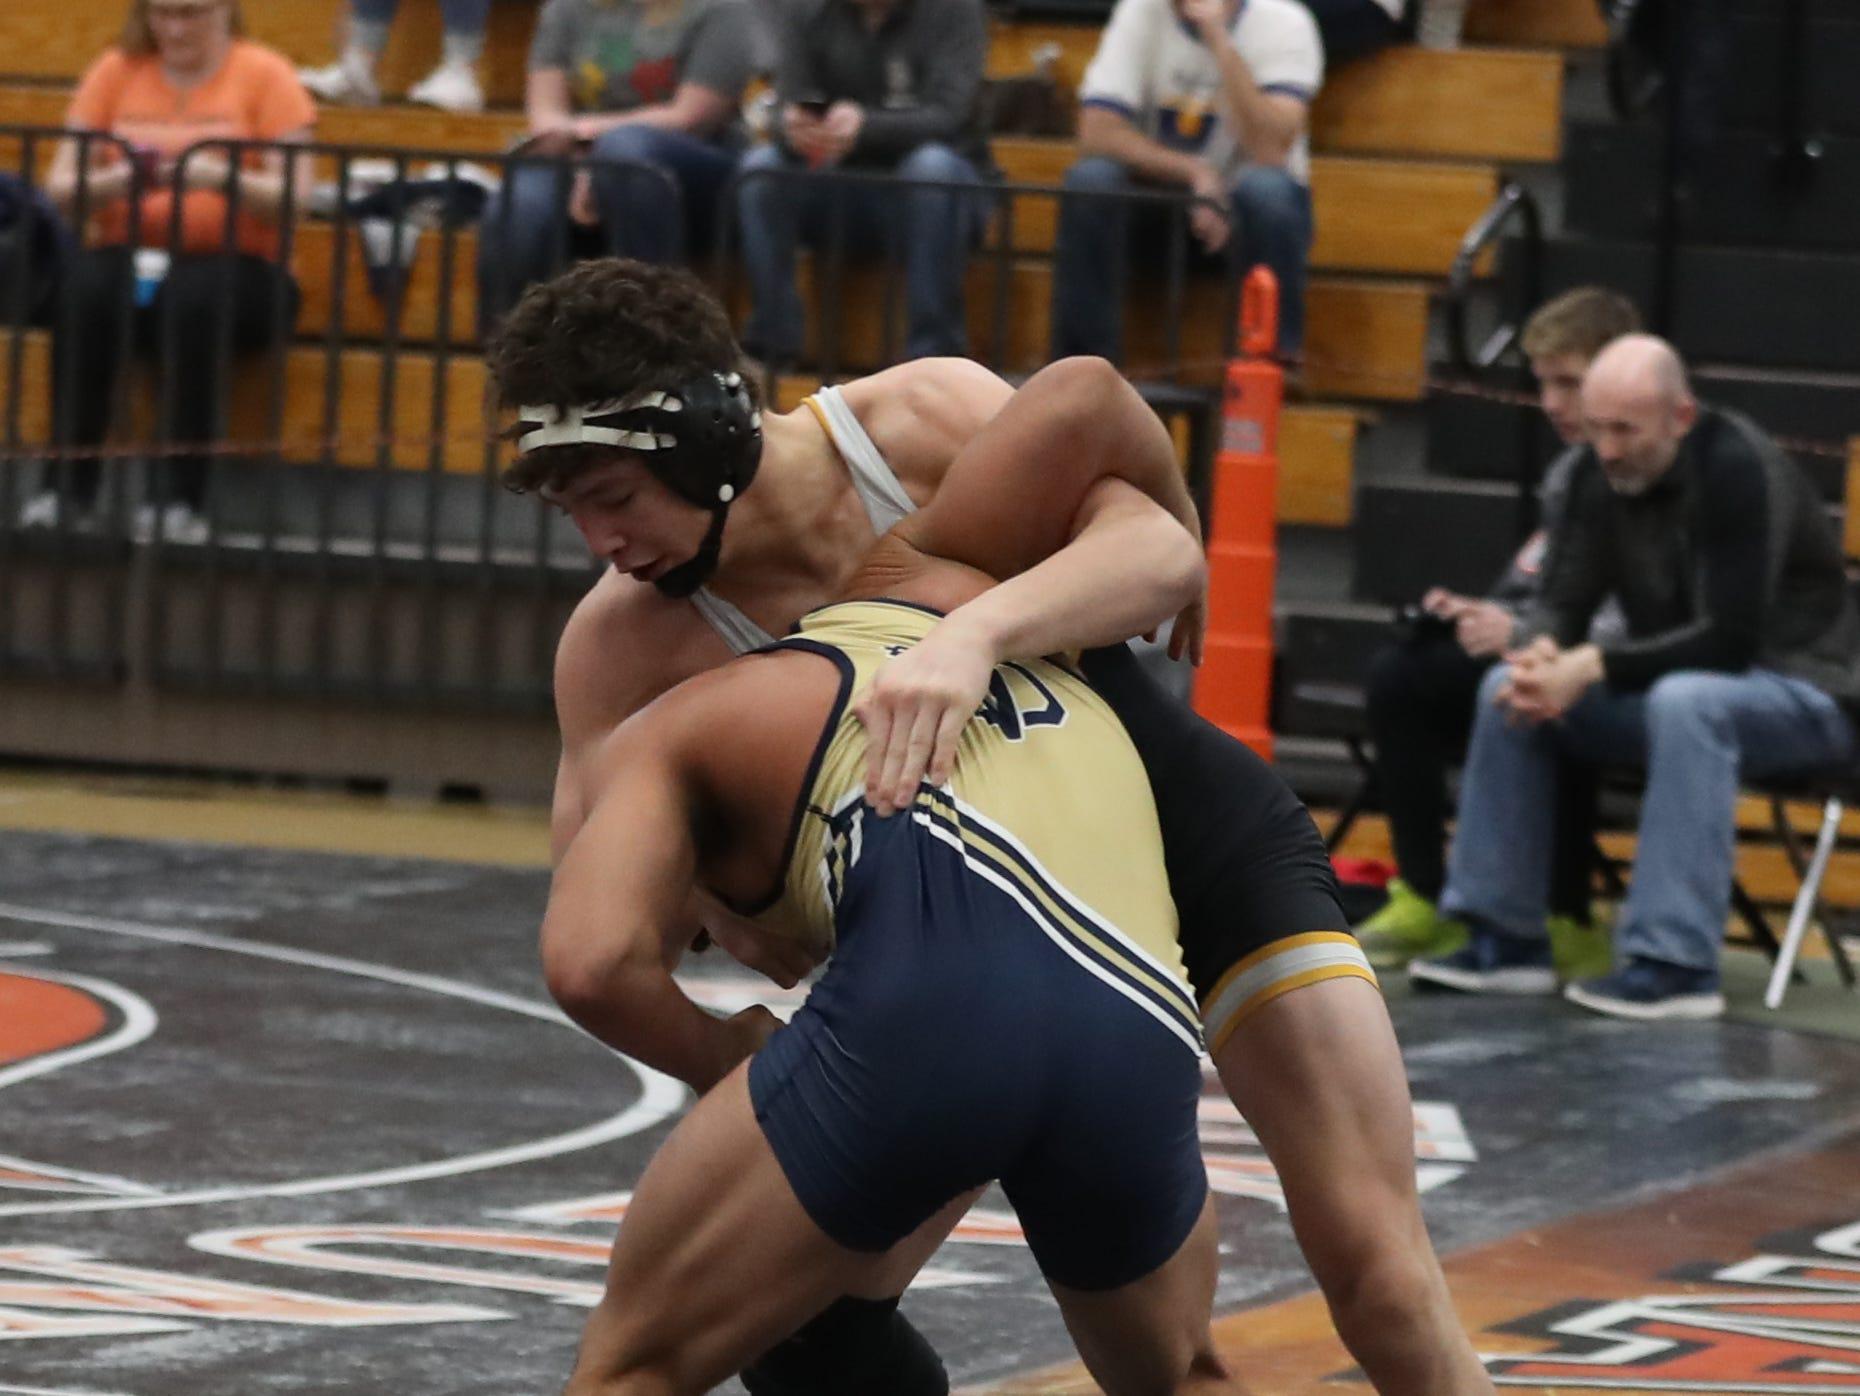 Cade DeVos ,of Southeast Polk High, wrestles at the Cheesehead Invitational at Kaukauna High School in Kaukauna, Wisconsin, on Jan. 5, 2019.